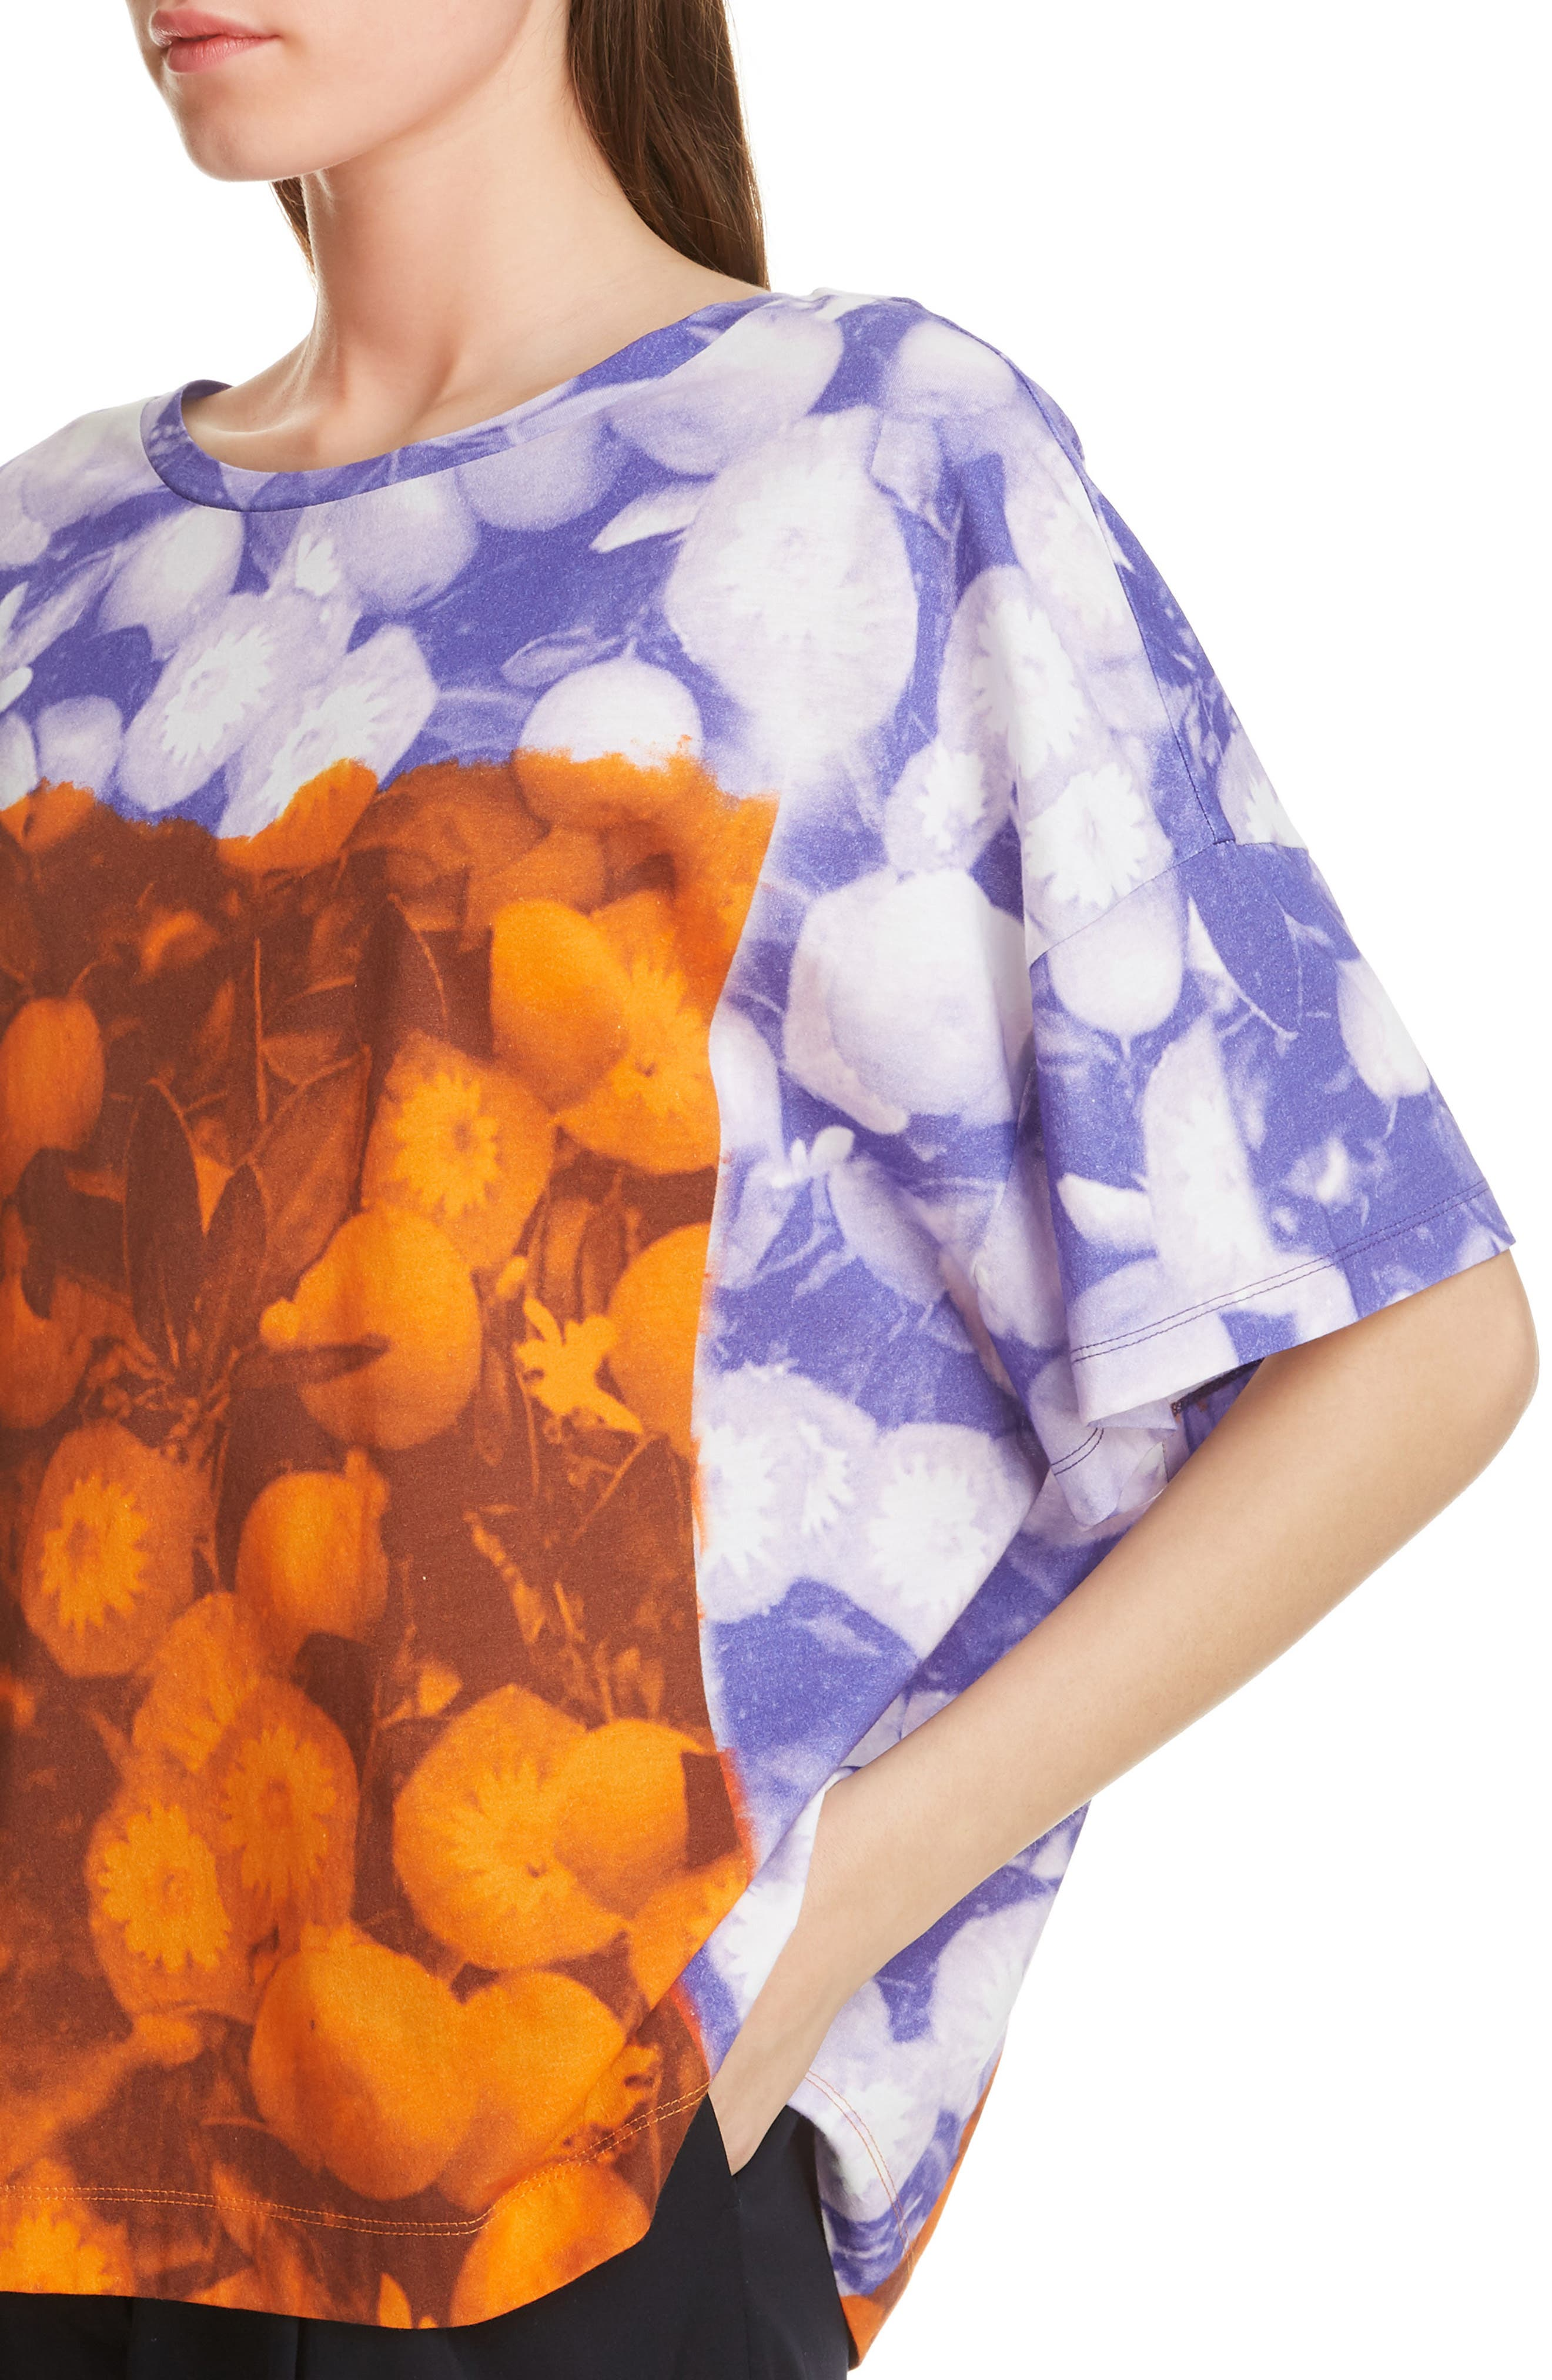 DRIES VAN NOTEN, Hebola Print Cotton Tee, Alternate thumbnail 4, color, 976-DES.B